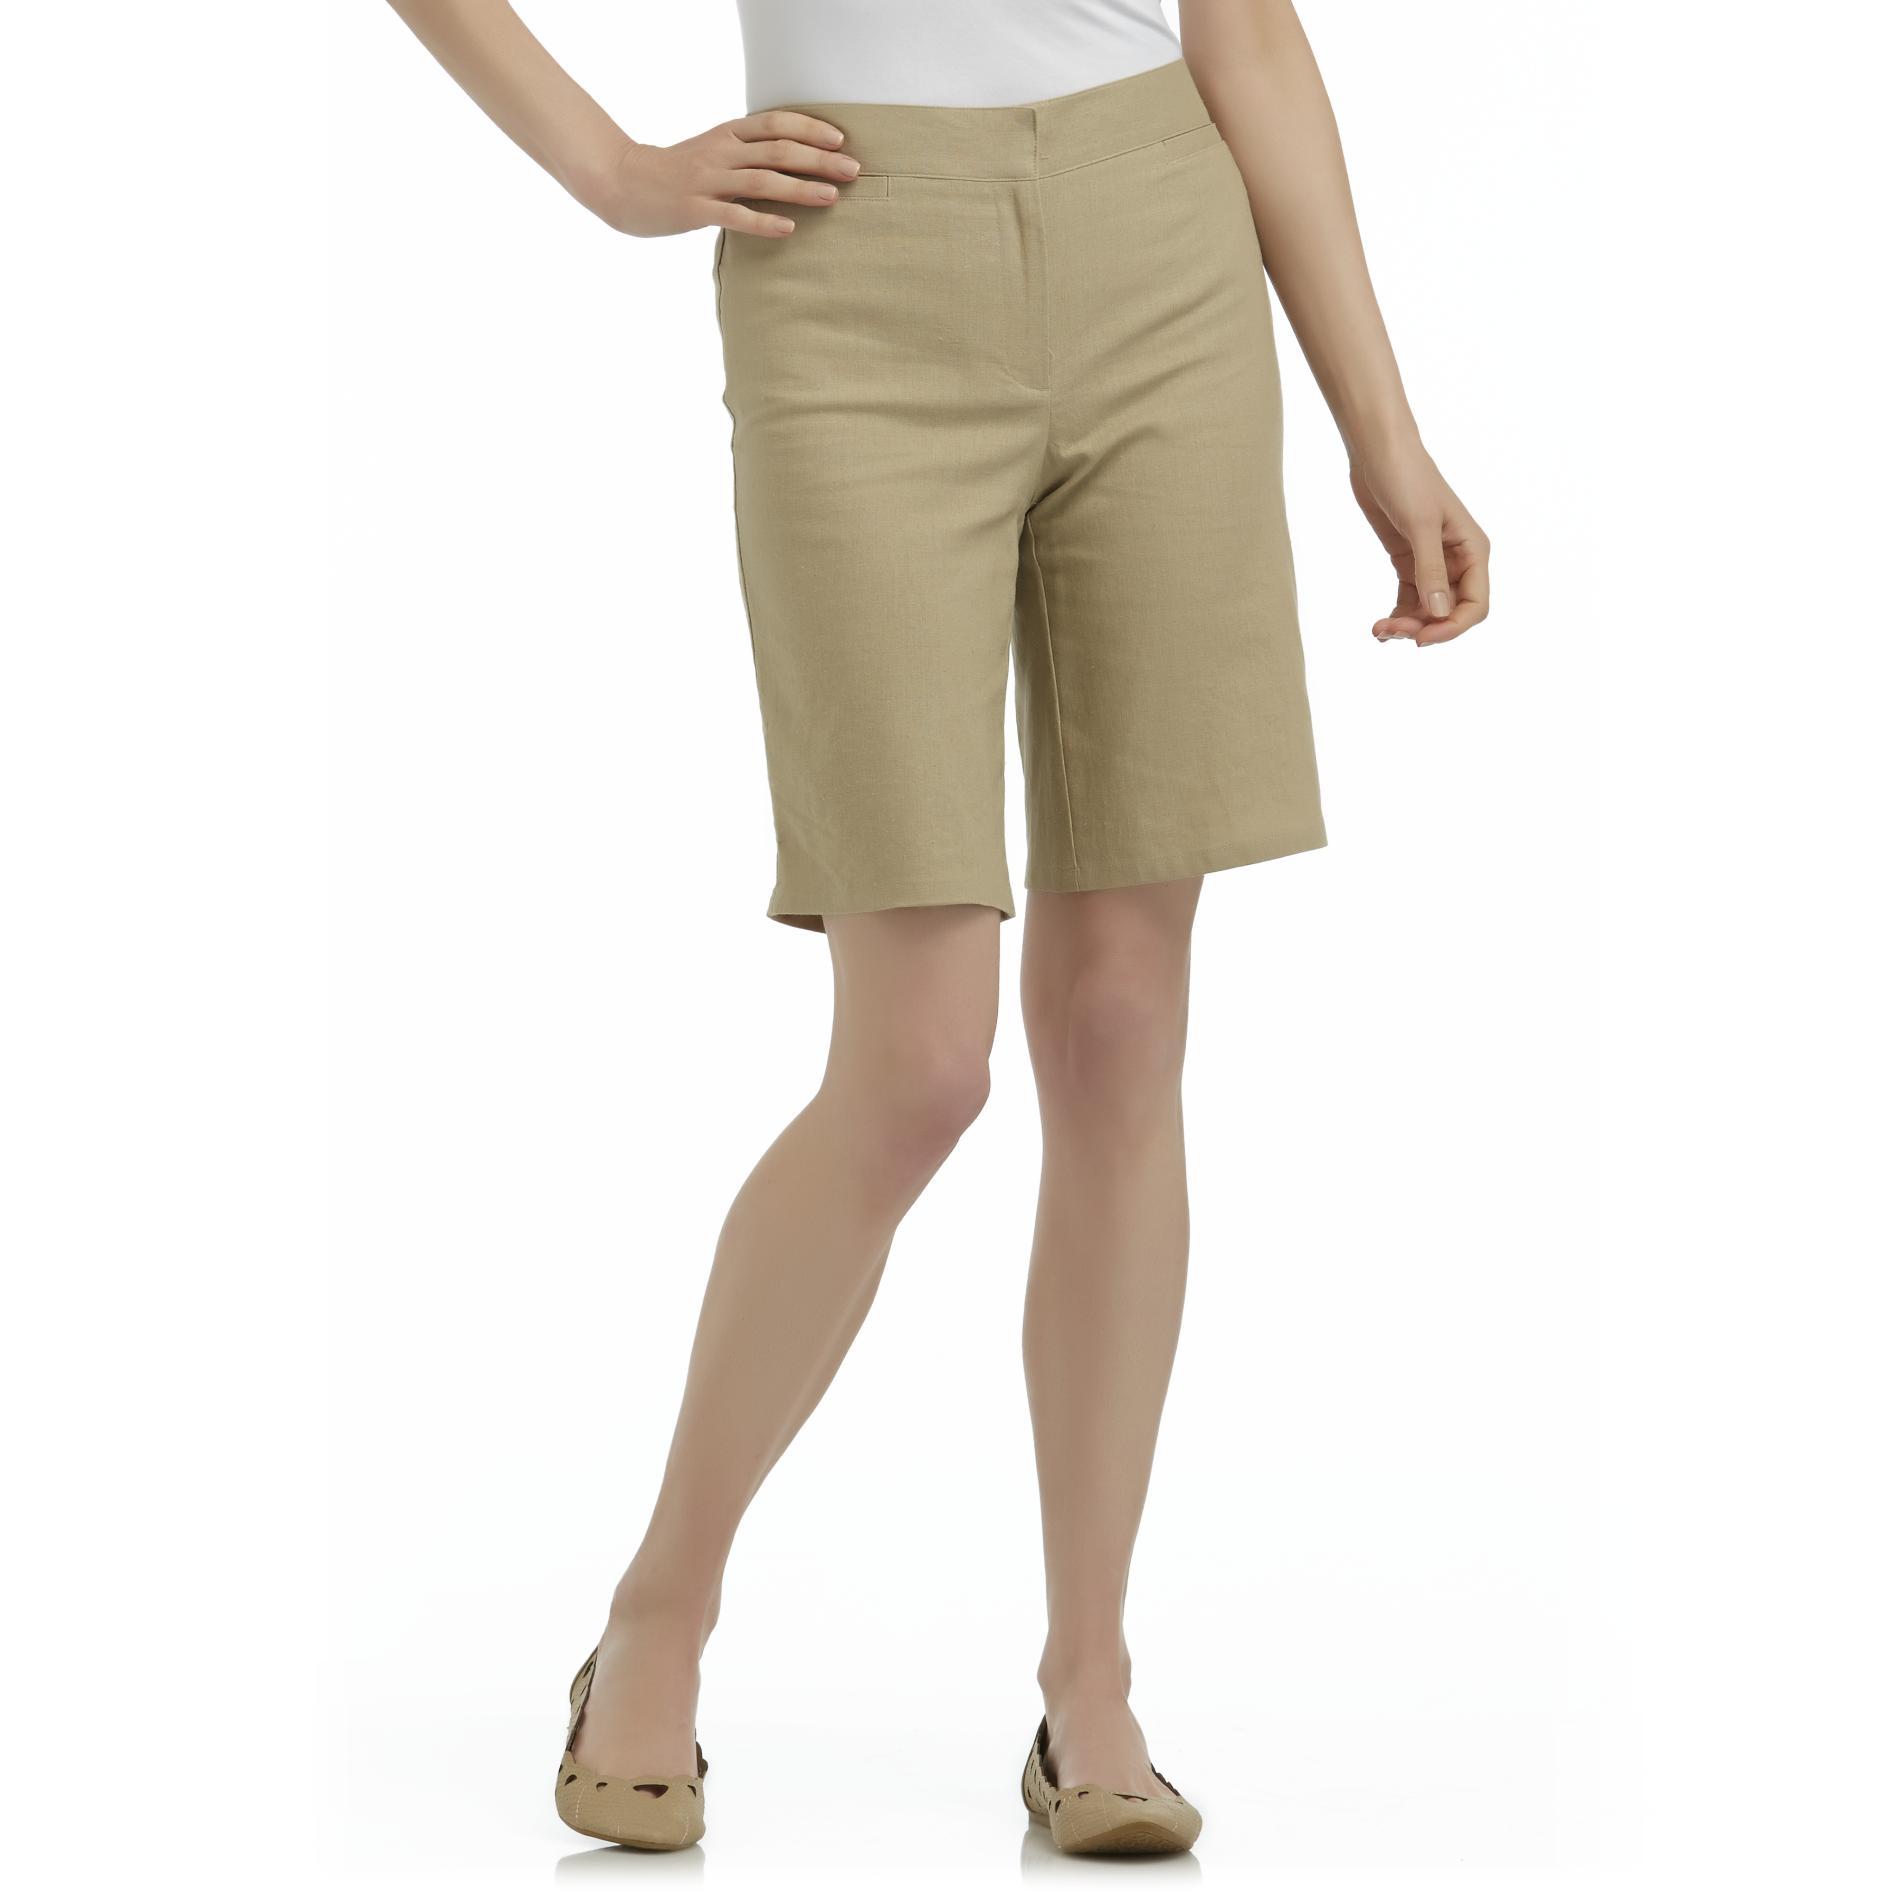 Jaclyn Smith Women's Linen Bermuda Shorts at Kmart.com